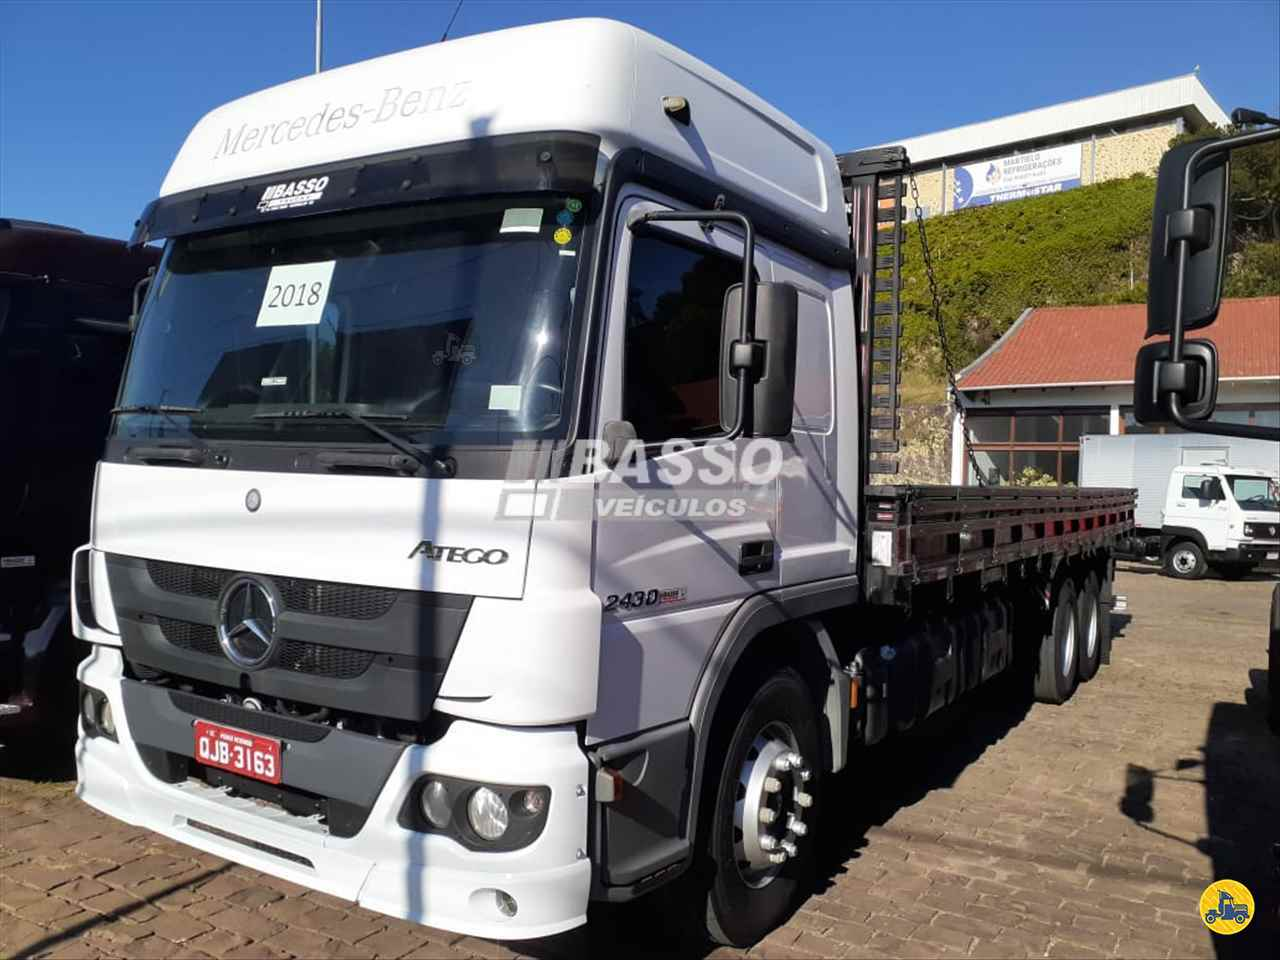 CAMINHAO MERCEDES-BENZ MB 2430 Chassis Truck 6x2 Basso Veículos GARIBALDI RIO GRANDE DO SUL RS